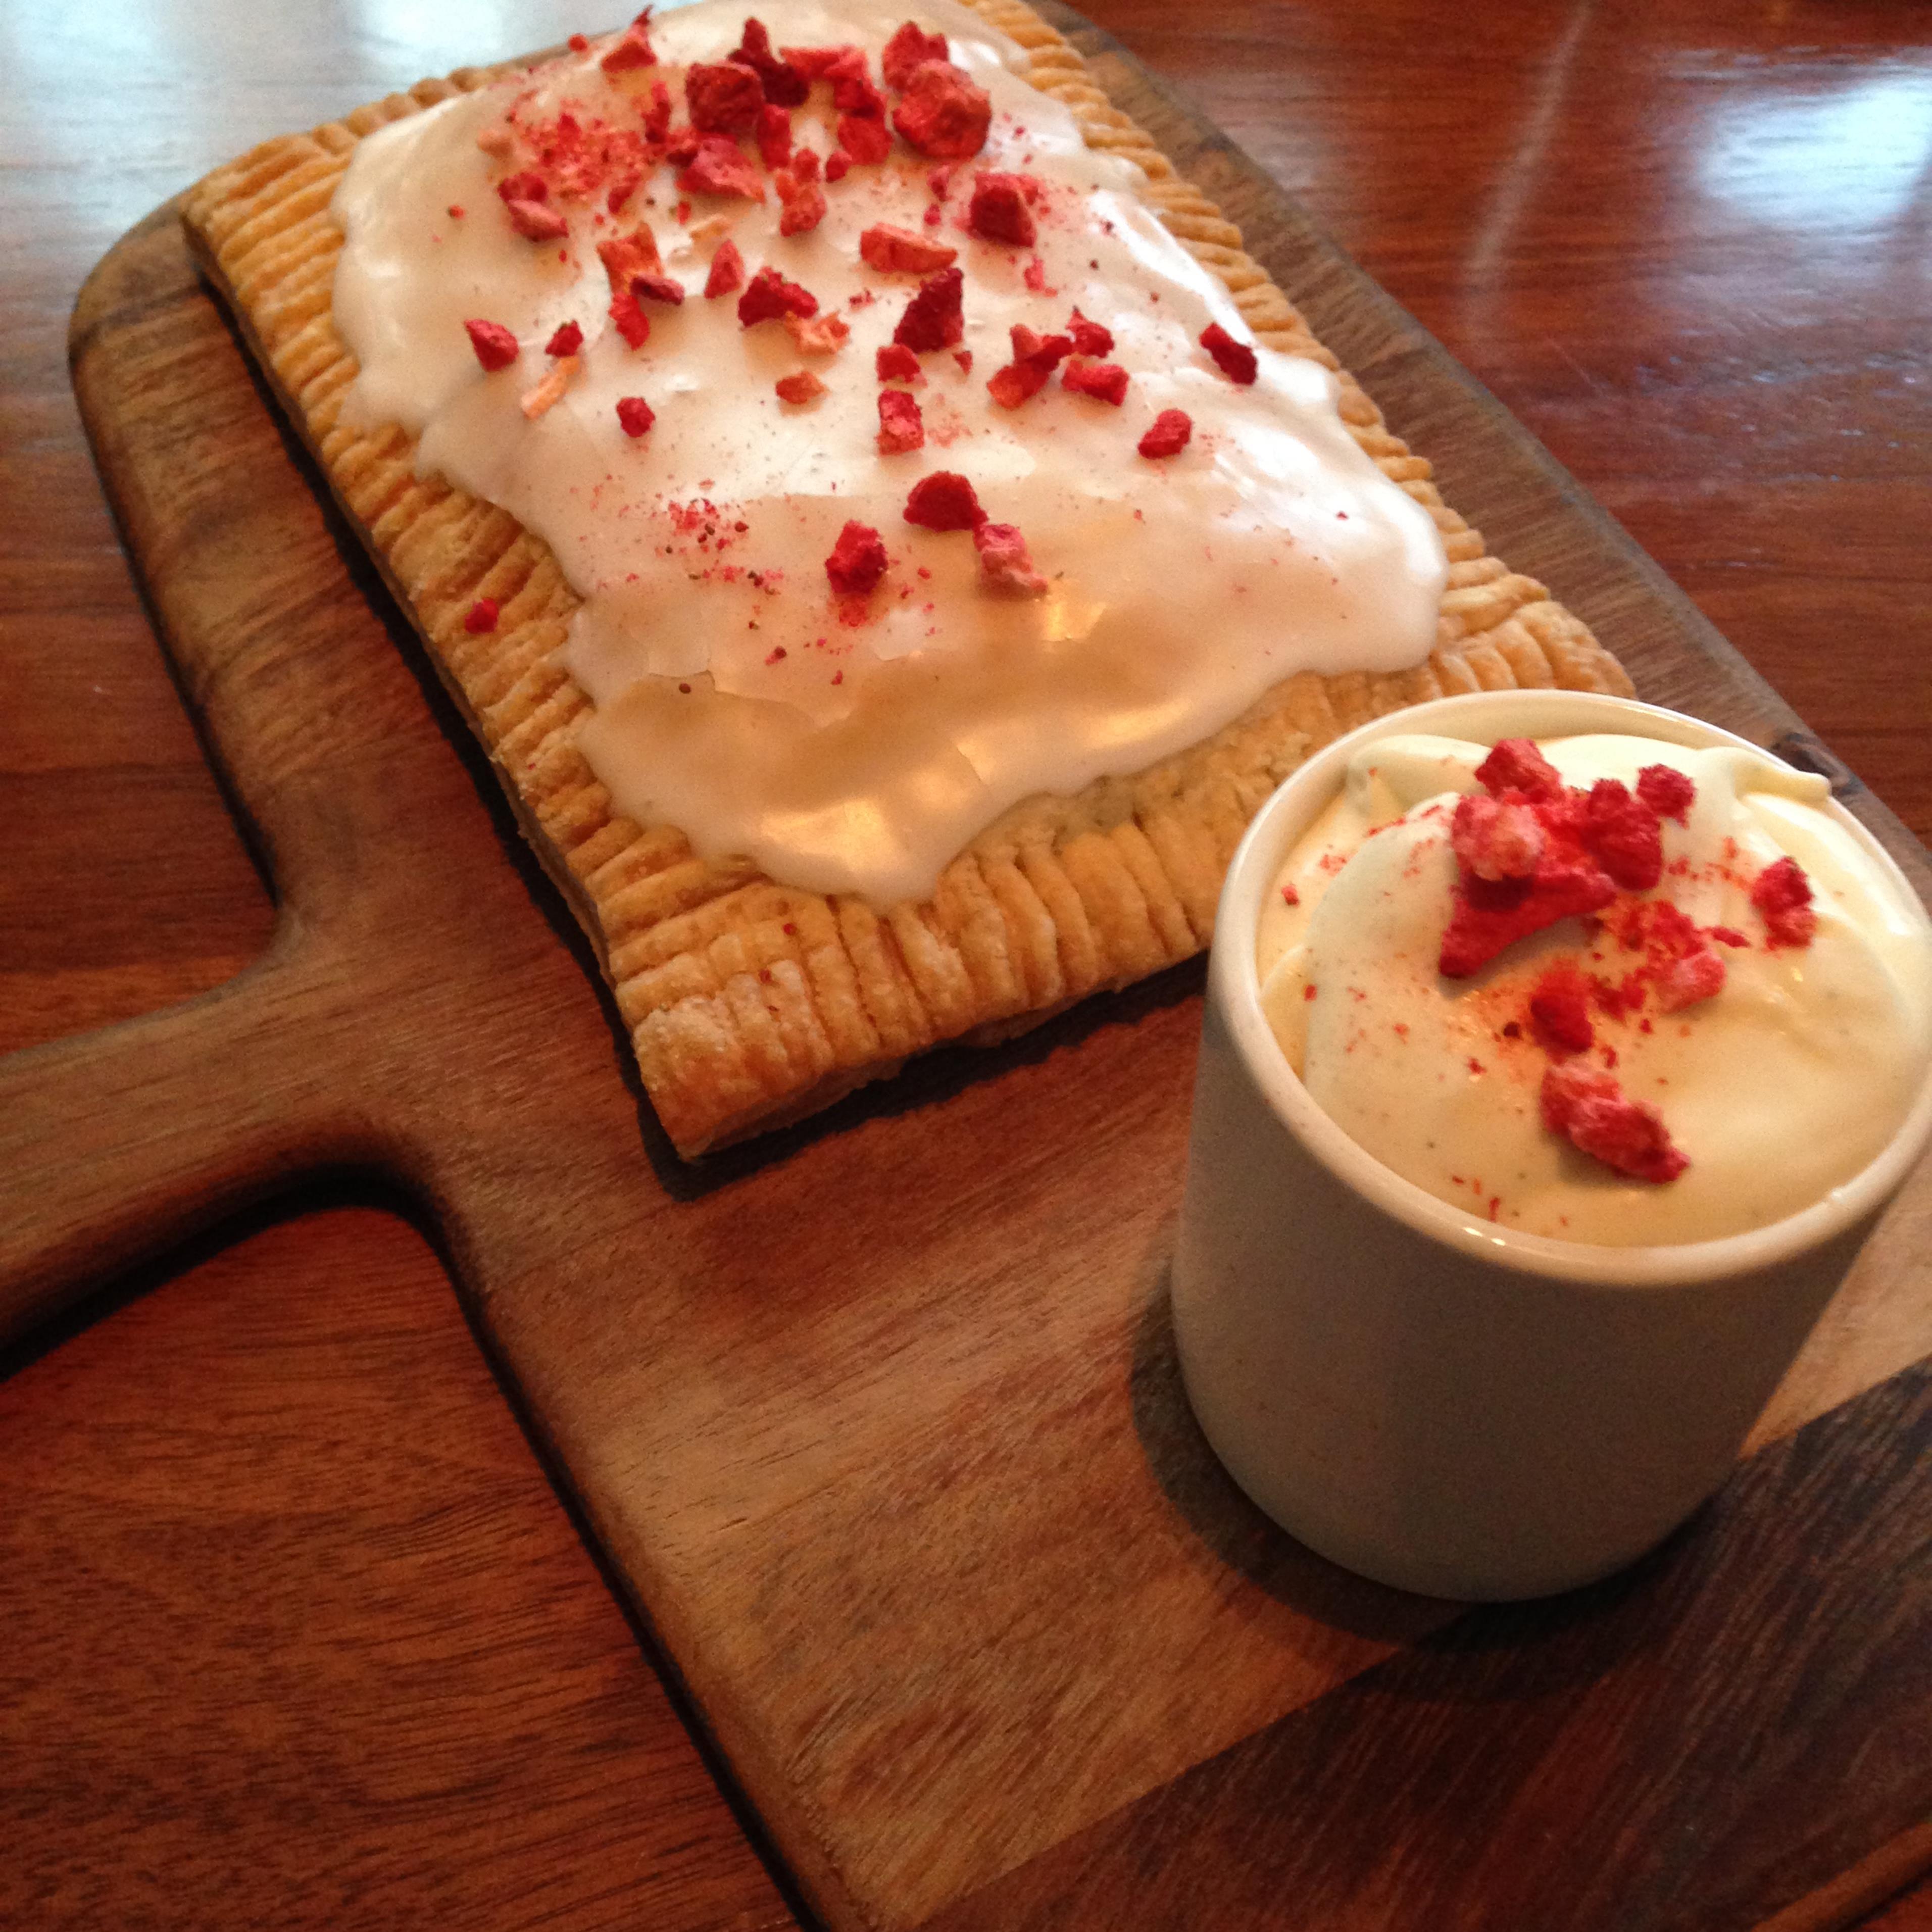 Strawberry rhubarb pop tart at Blue Duck Tavern